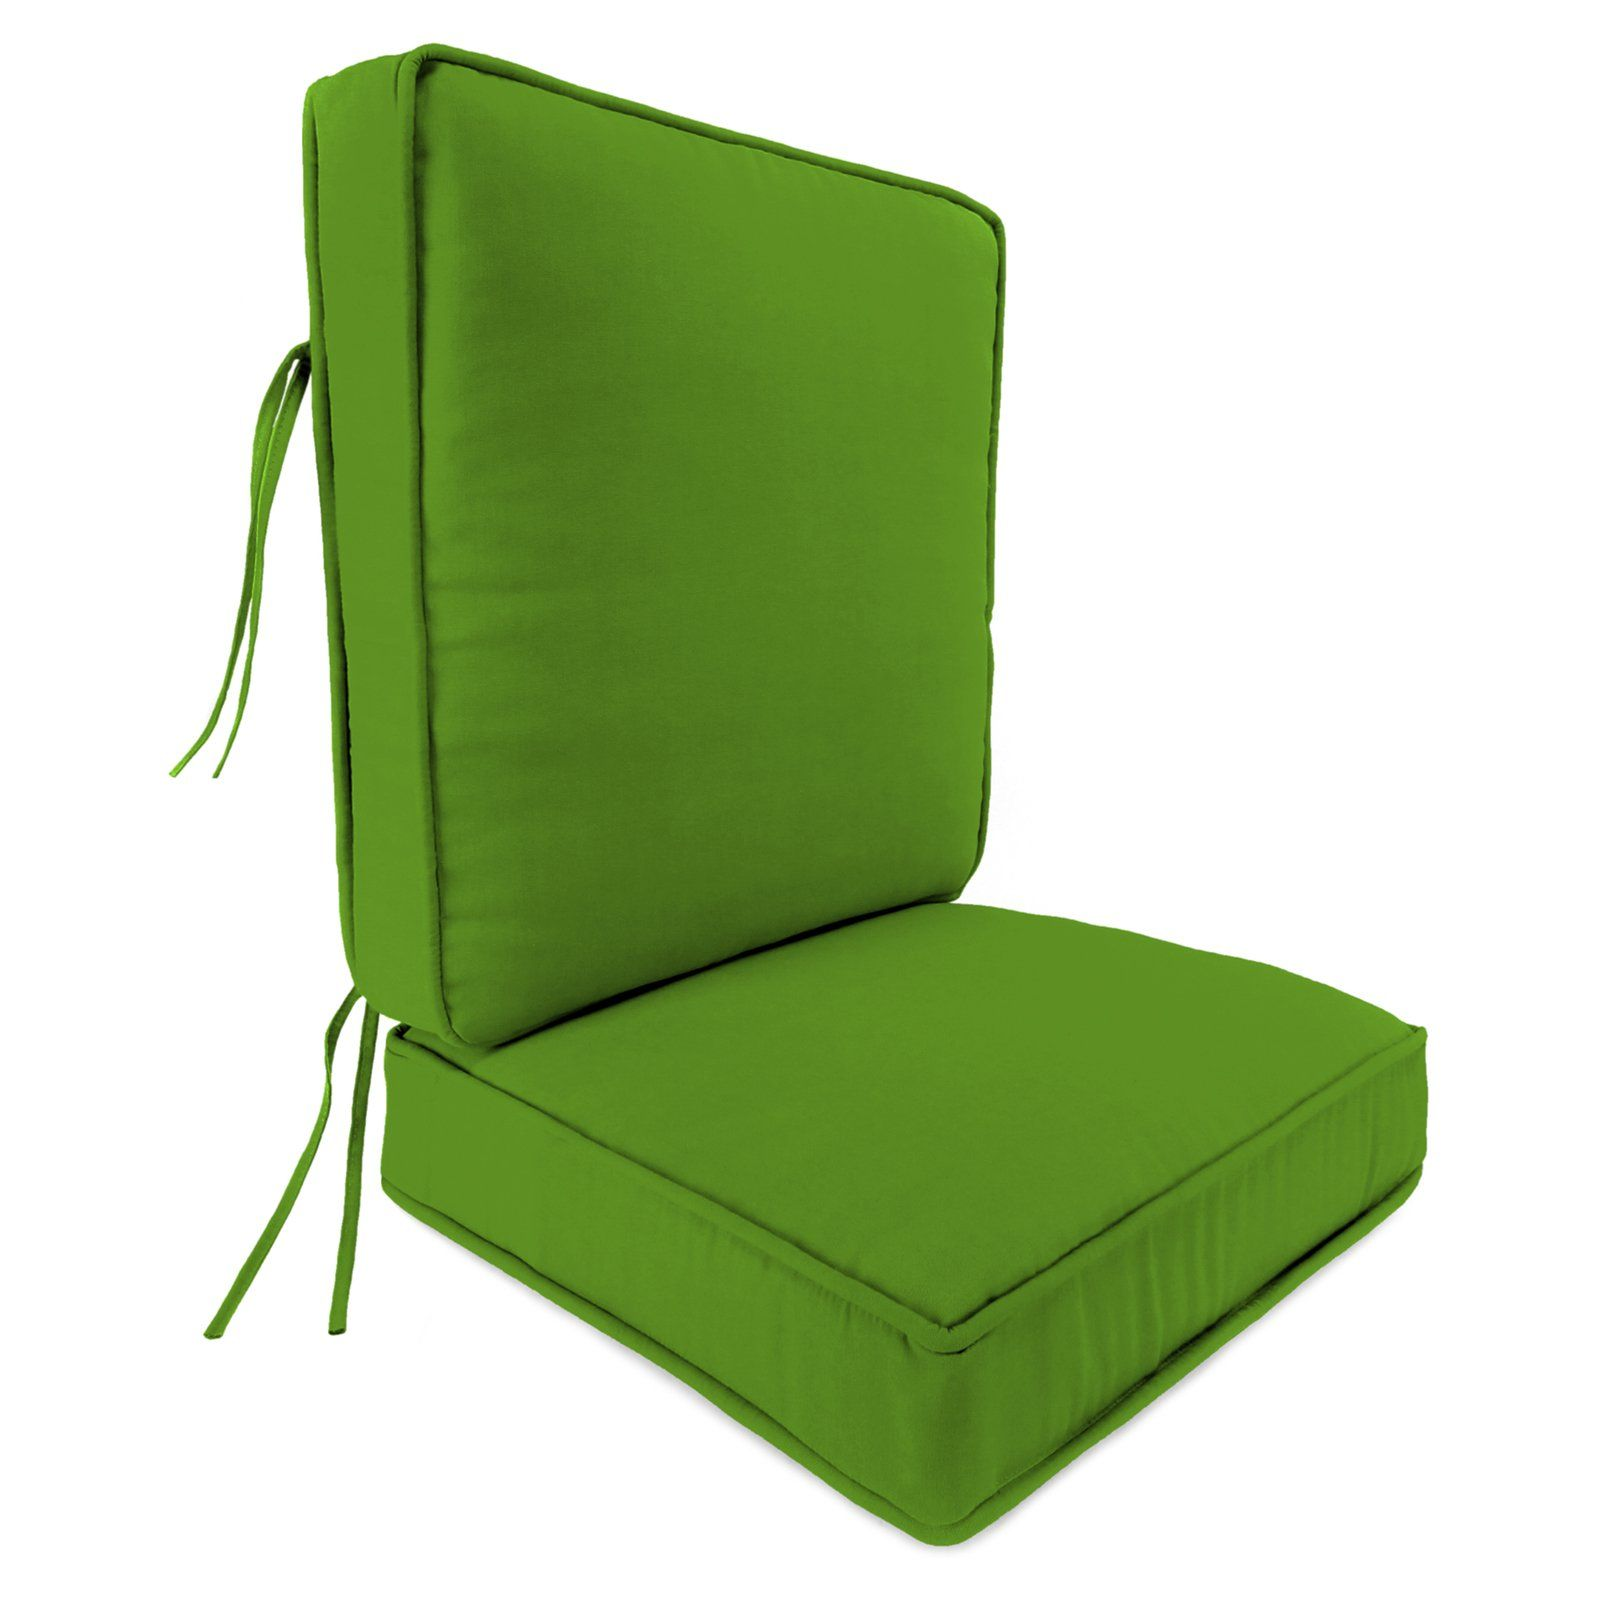 Jordan Manufacturing 24 X 22 5 In Outdoor Boxed Cushion With Cording Veranda Citrus